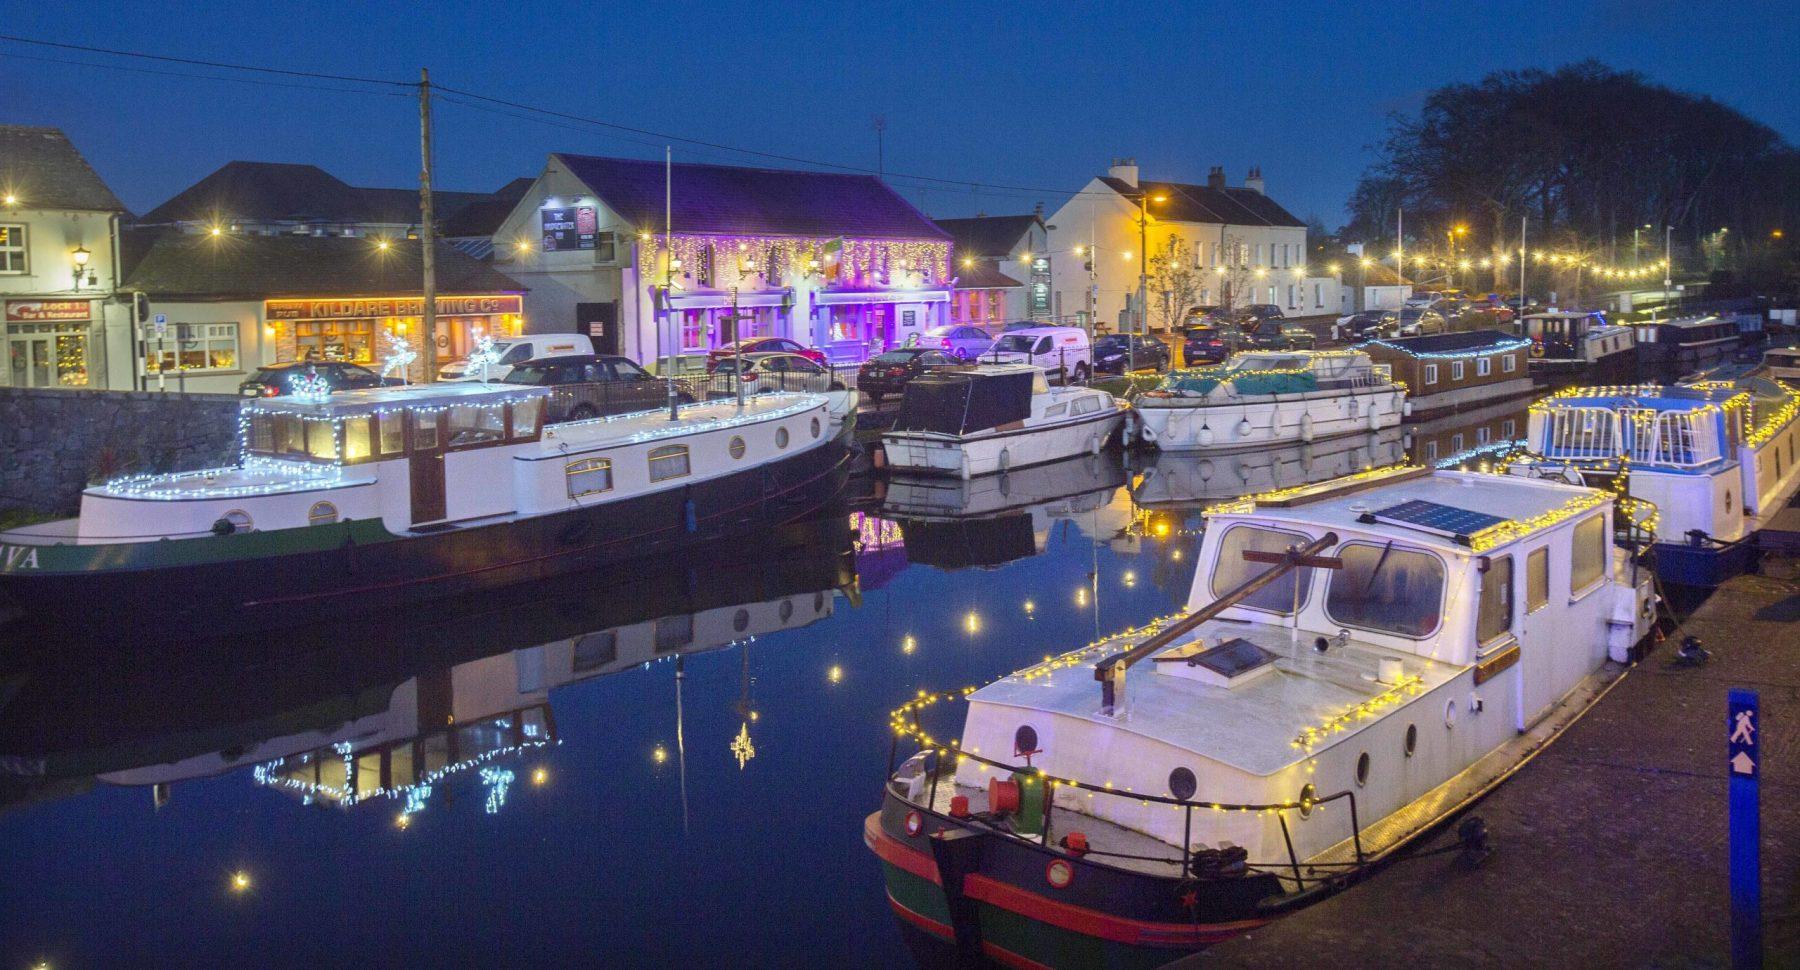 Christmas lights at Sallins Harbour.Photo: Tony Gavin 20/12/2019